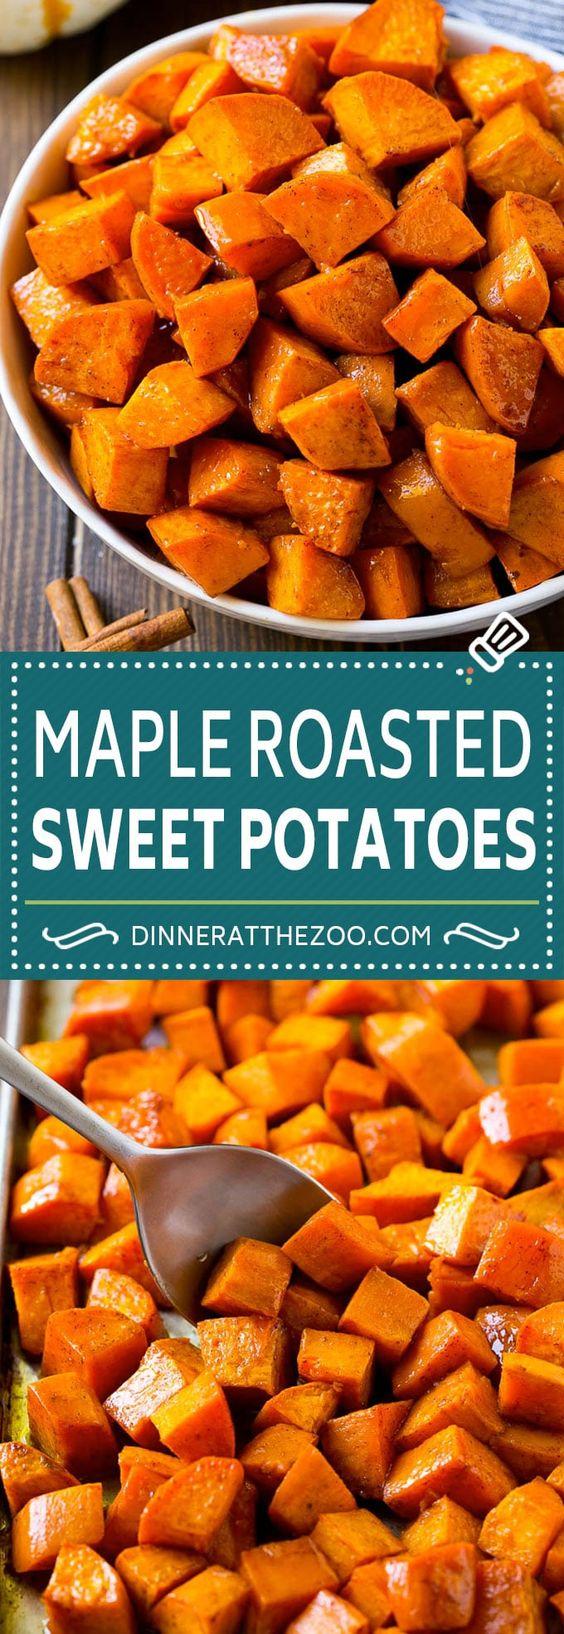 Maple Roasted Sweet Potatoes Recipe   Easy Sweet Potatoes   Baked Sweet Potatoes   Sweet Potato Side Dish #sweetpotatoes #cinnamon #maple #butter #fall #sidedish #dinner #dinneratthezoo